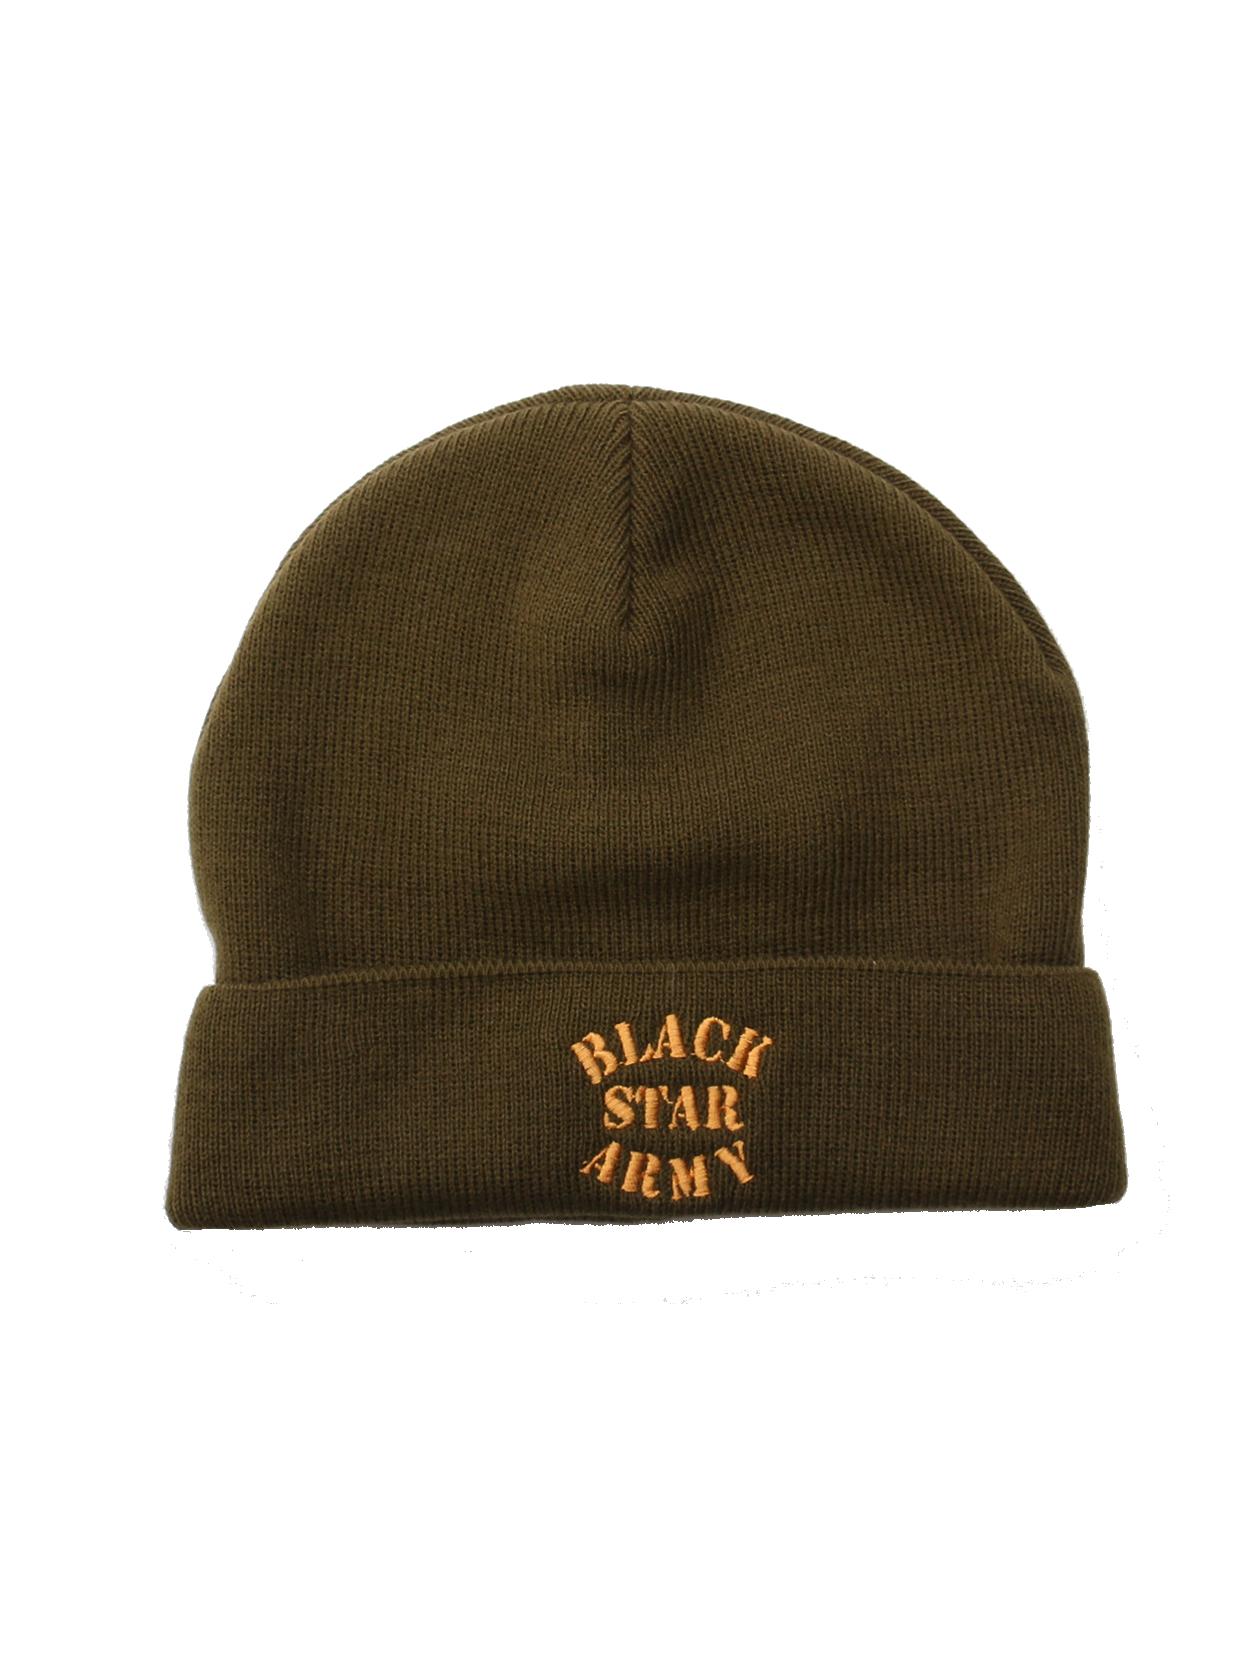 Unisex beanie Black Star Army